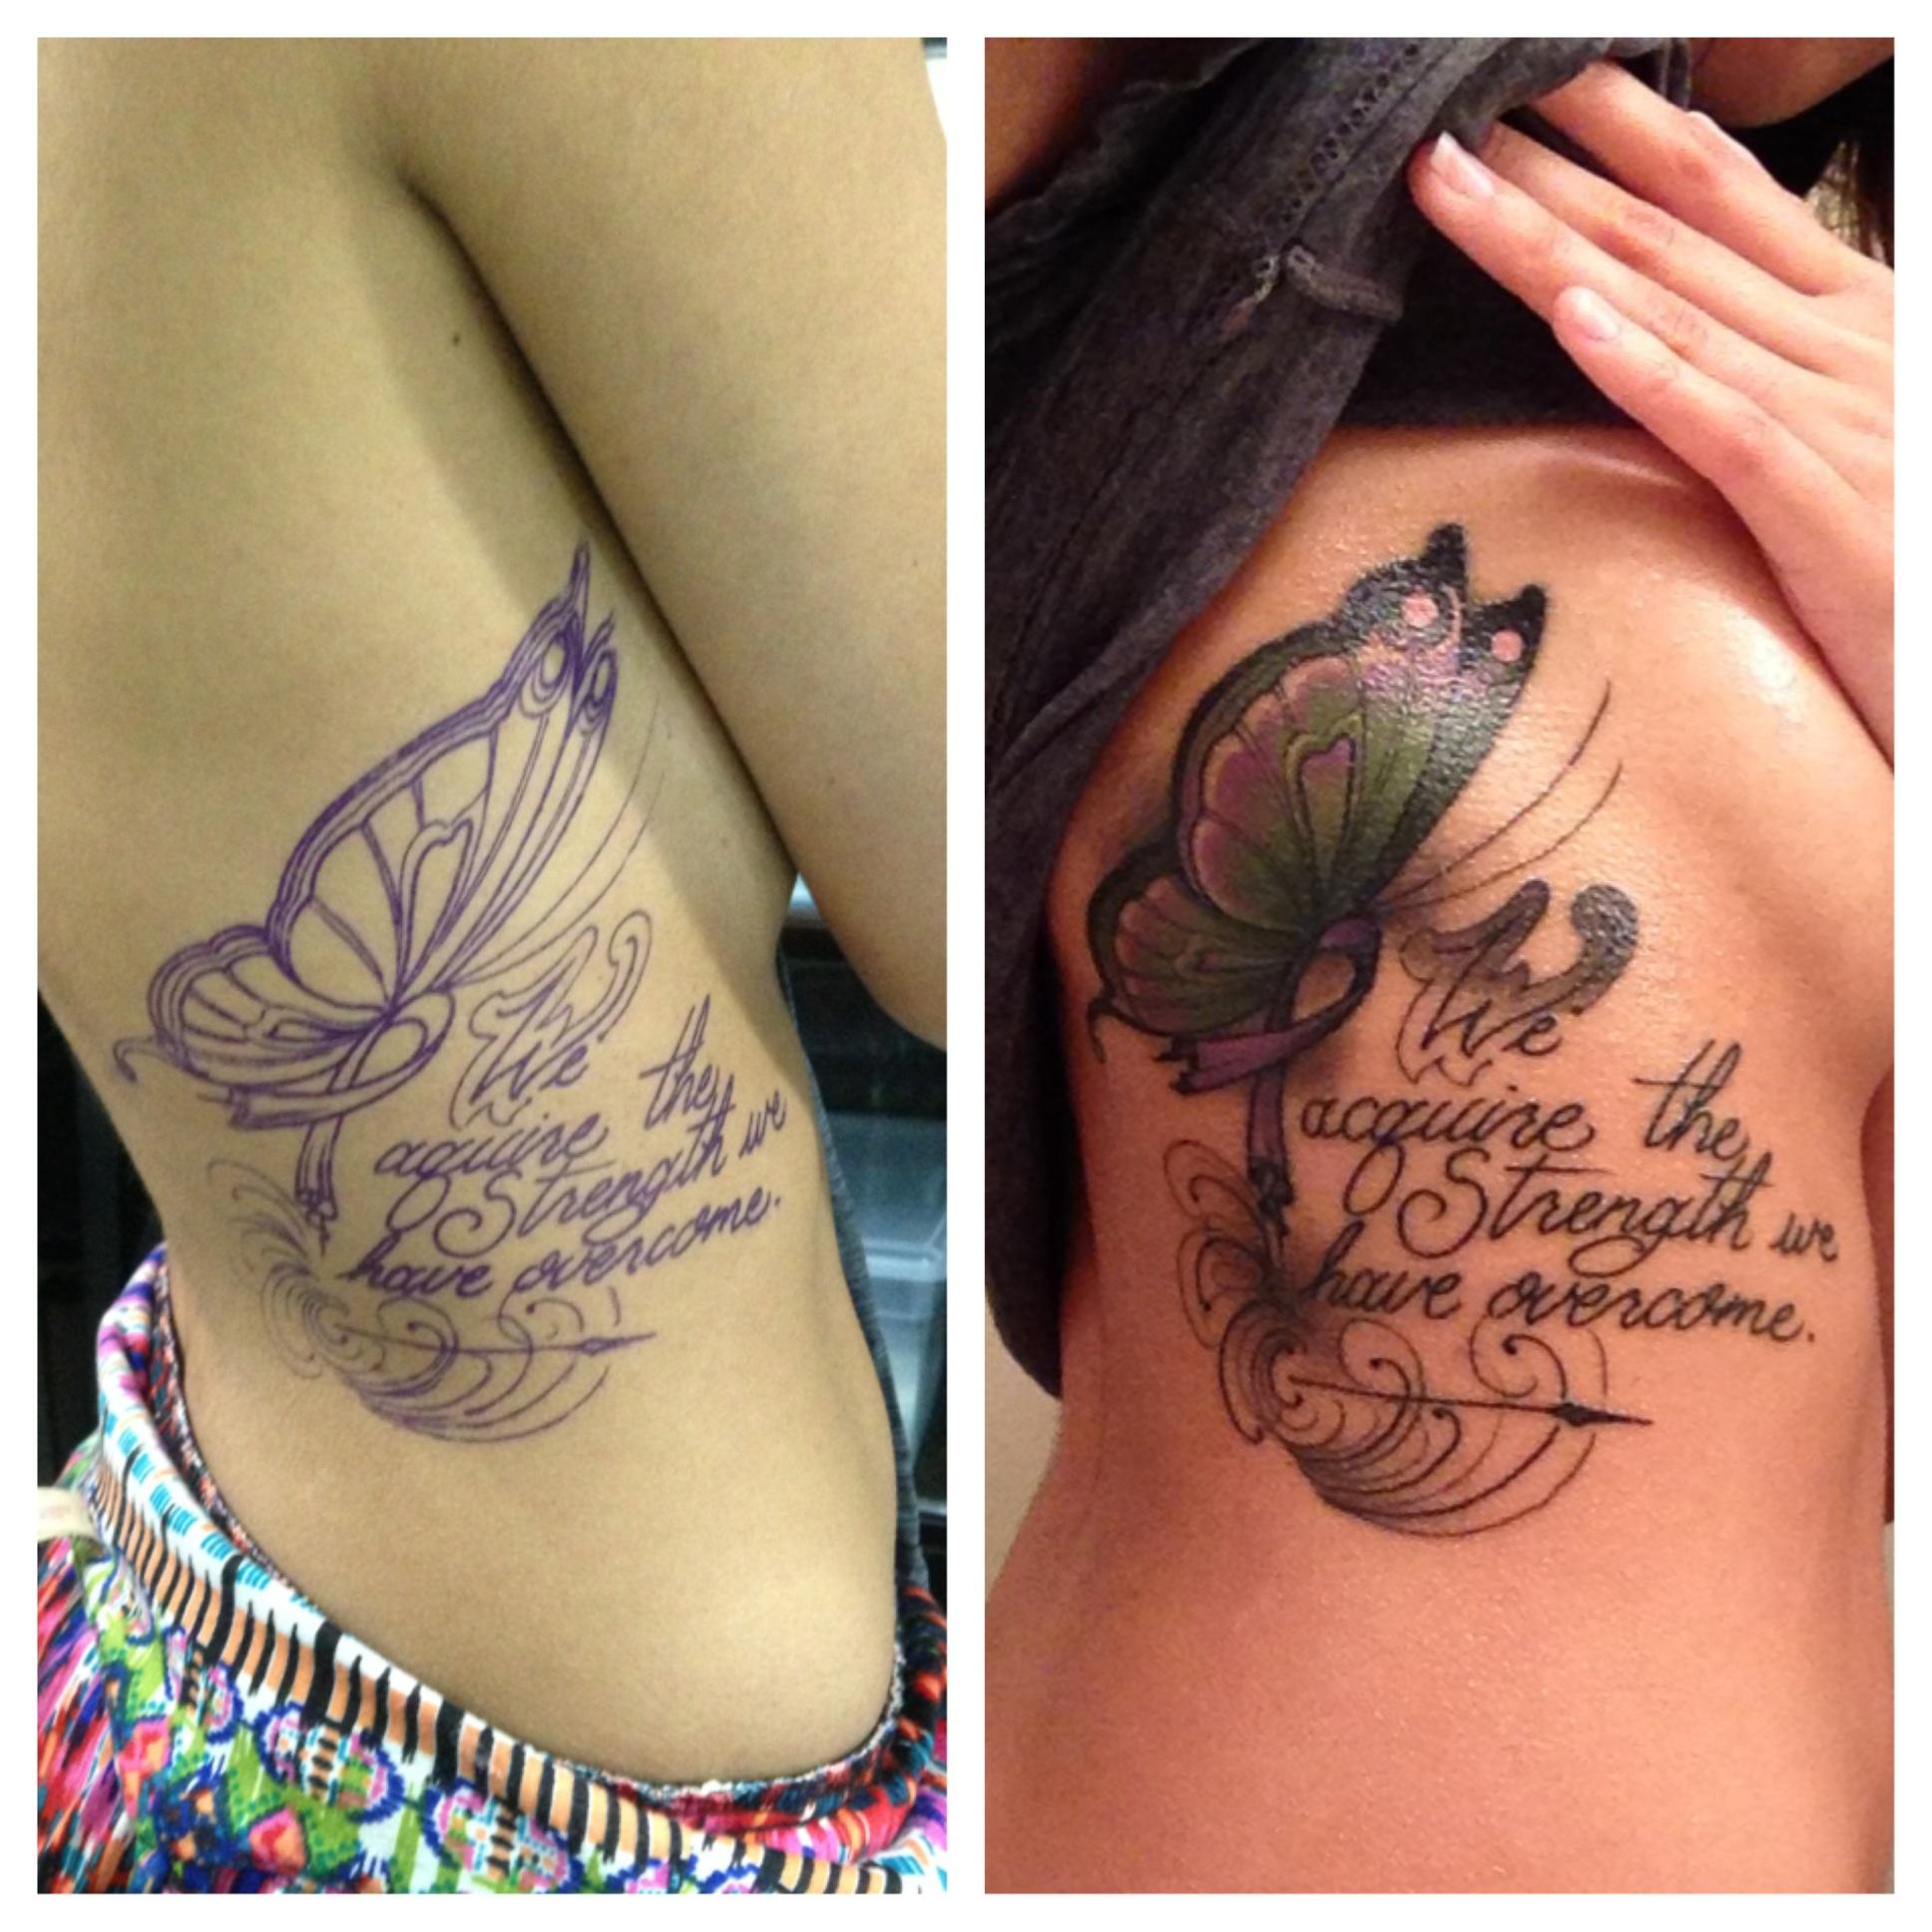 Tattoo Quotes About Parents Quotesgram: Quotes About Overcoming Struggles Tattoo. QuotesGram